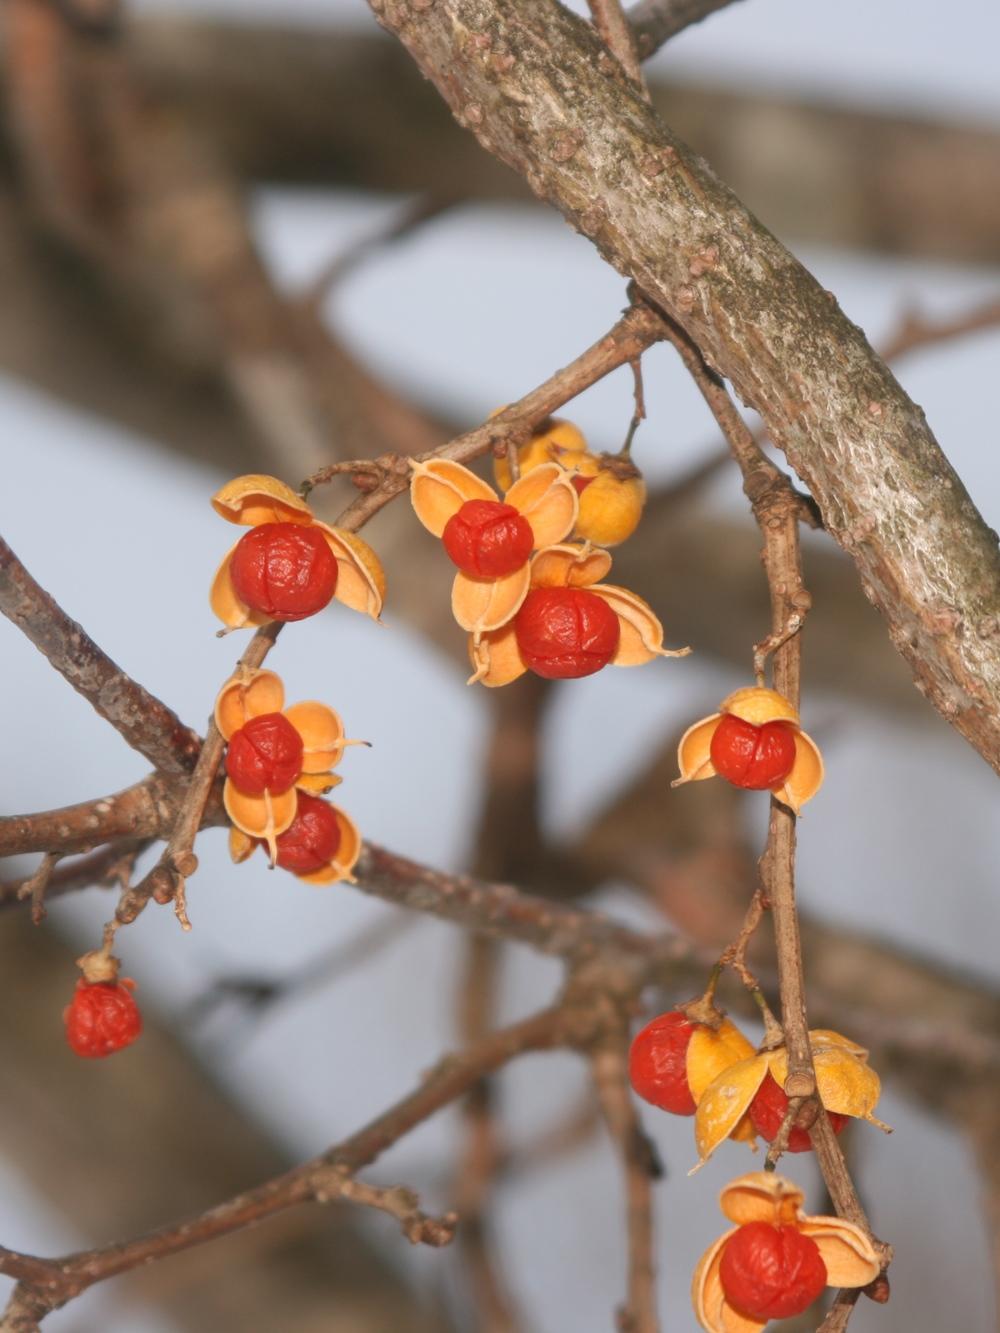 Oriental bittersweet fruits. Photo credit: Alpsdake, wikimedia commons